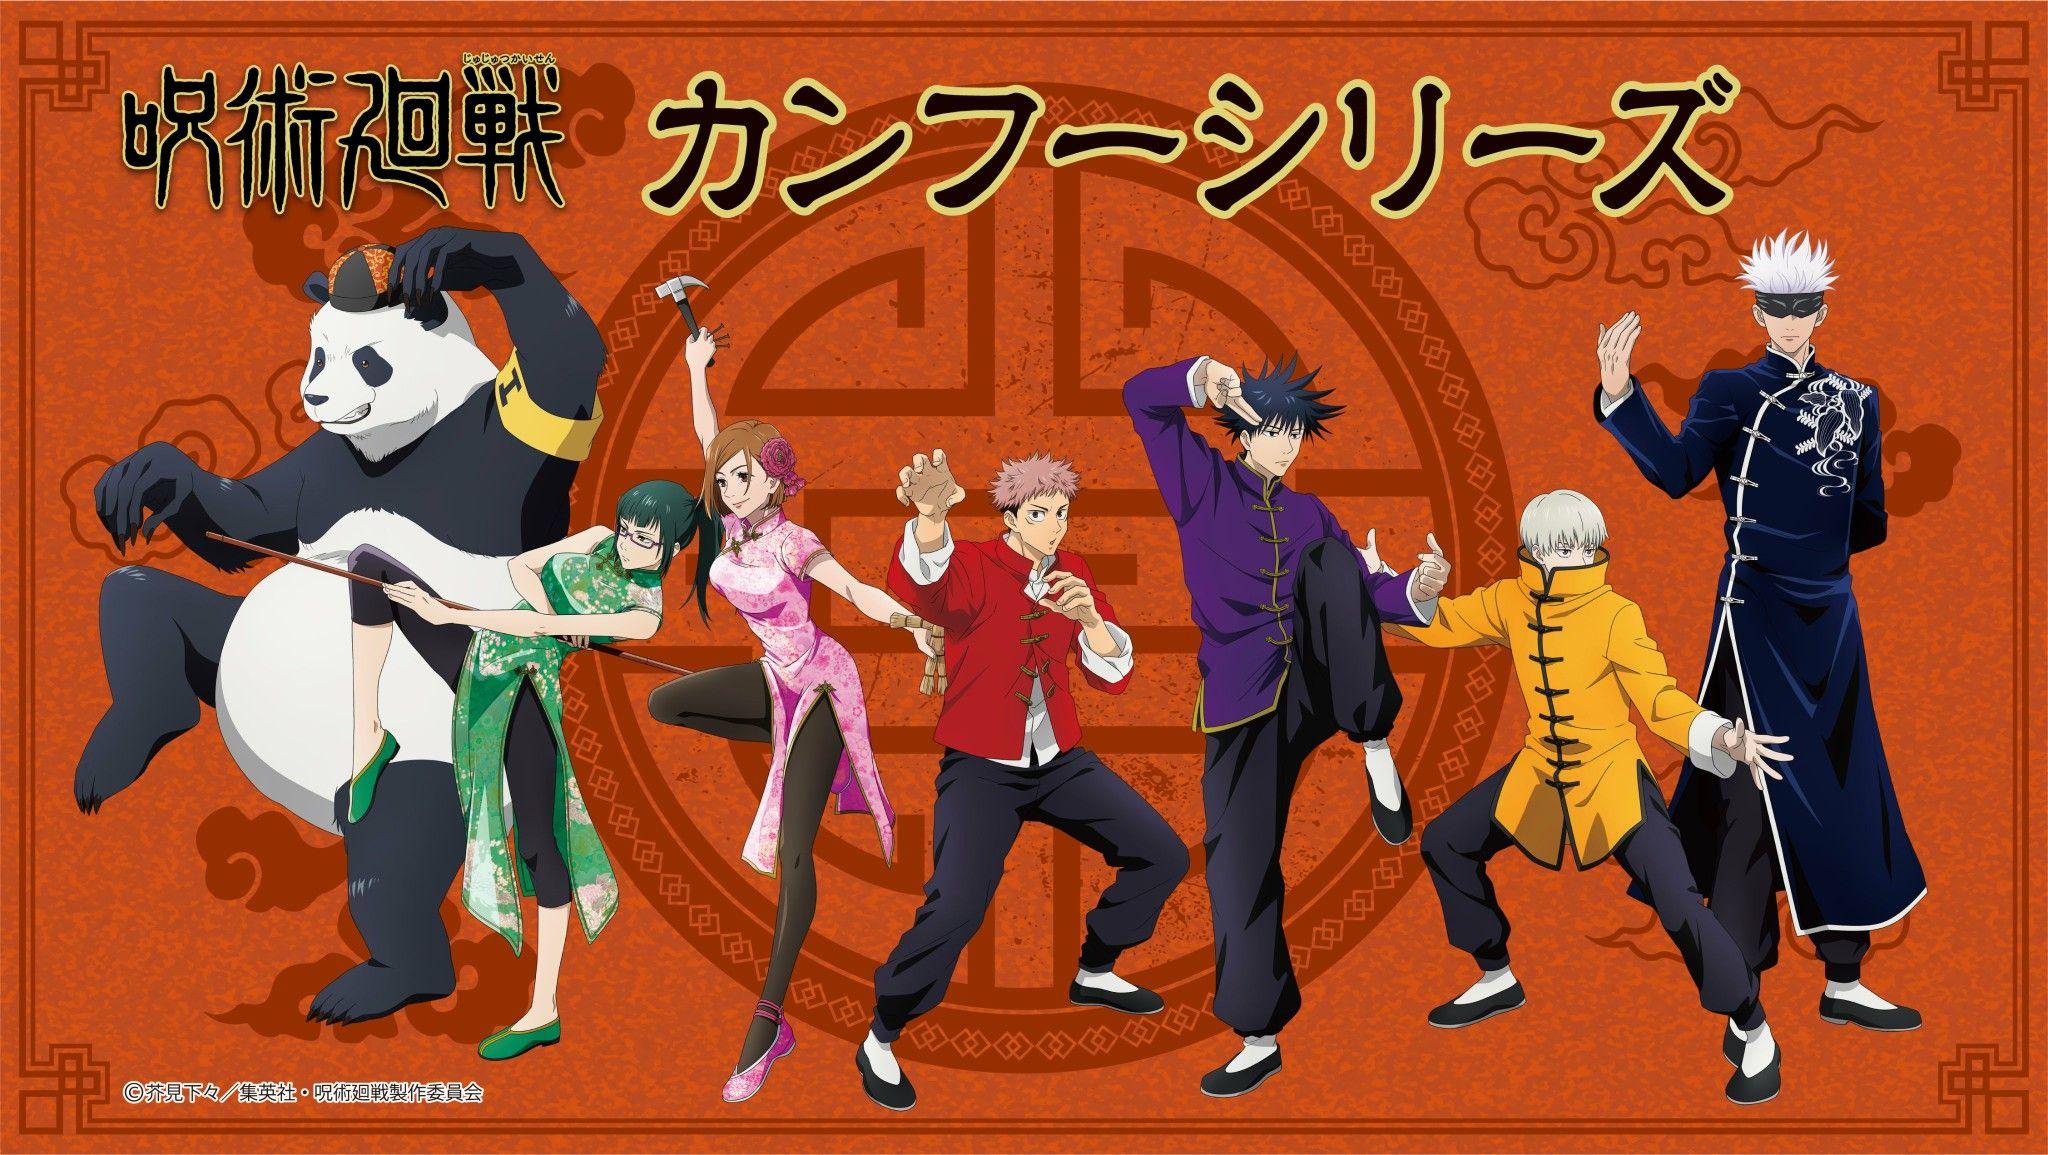 Jujutsu Kaisen Official Art Jujutsu Kung Fu Manga Covers